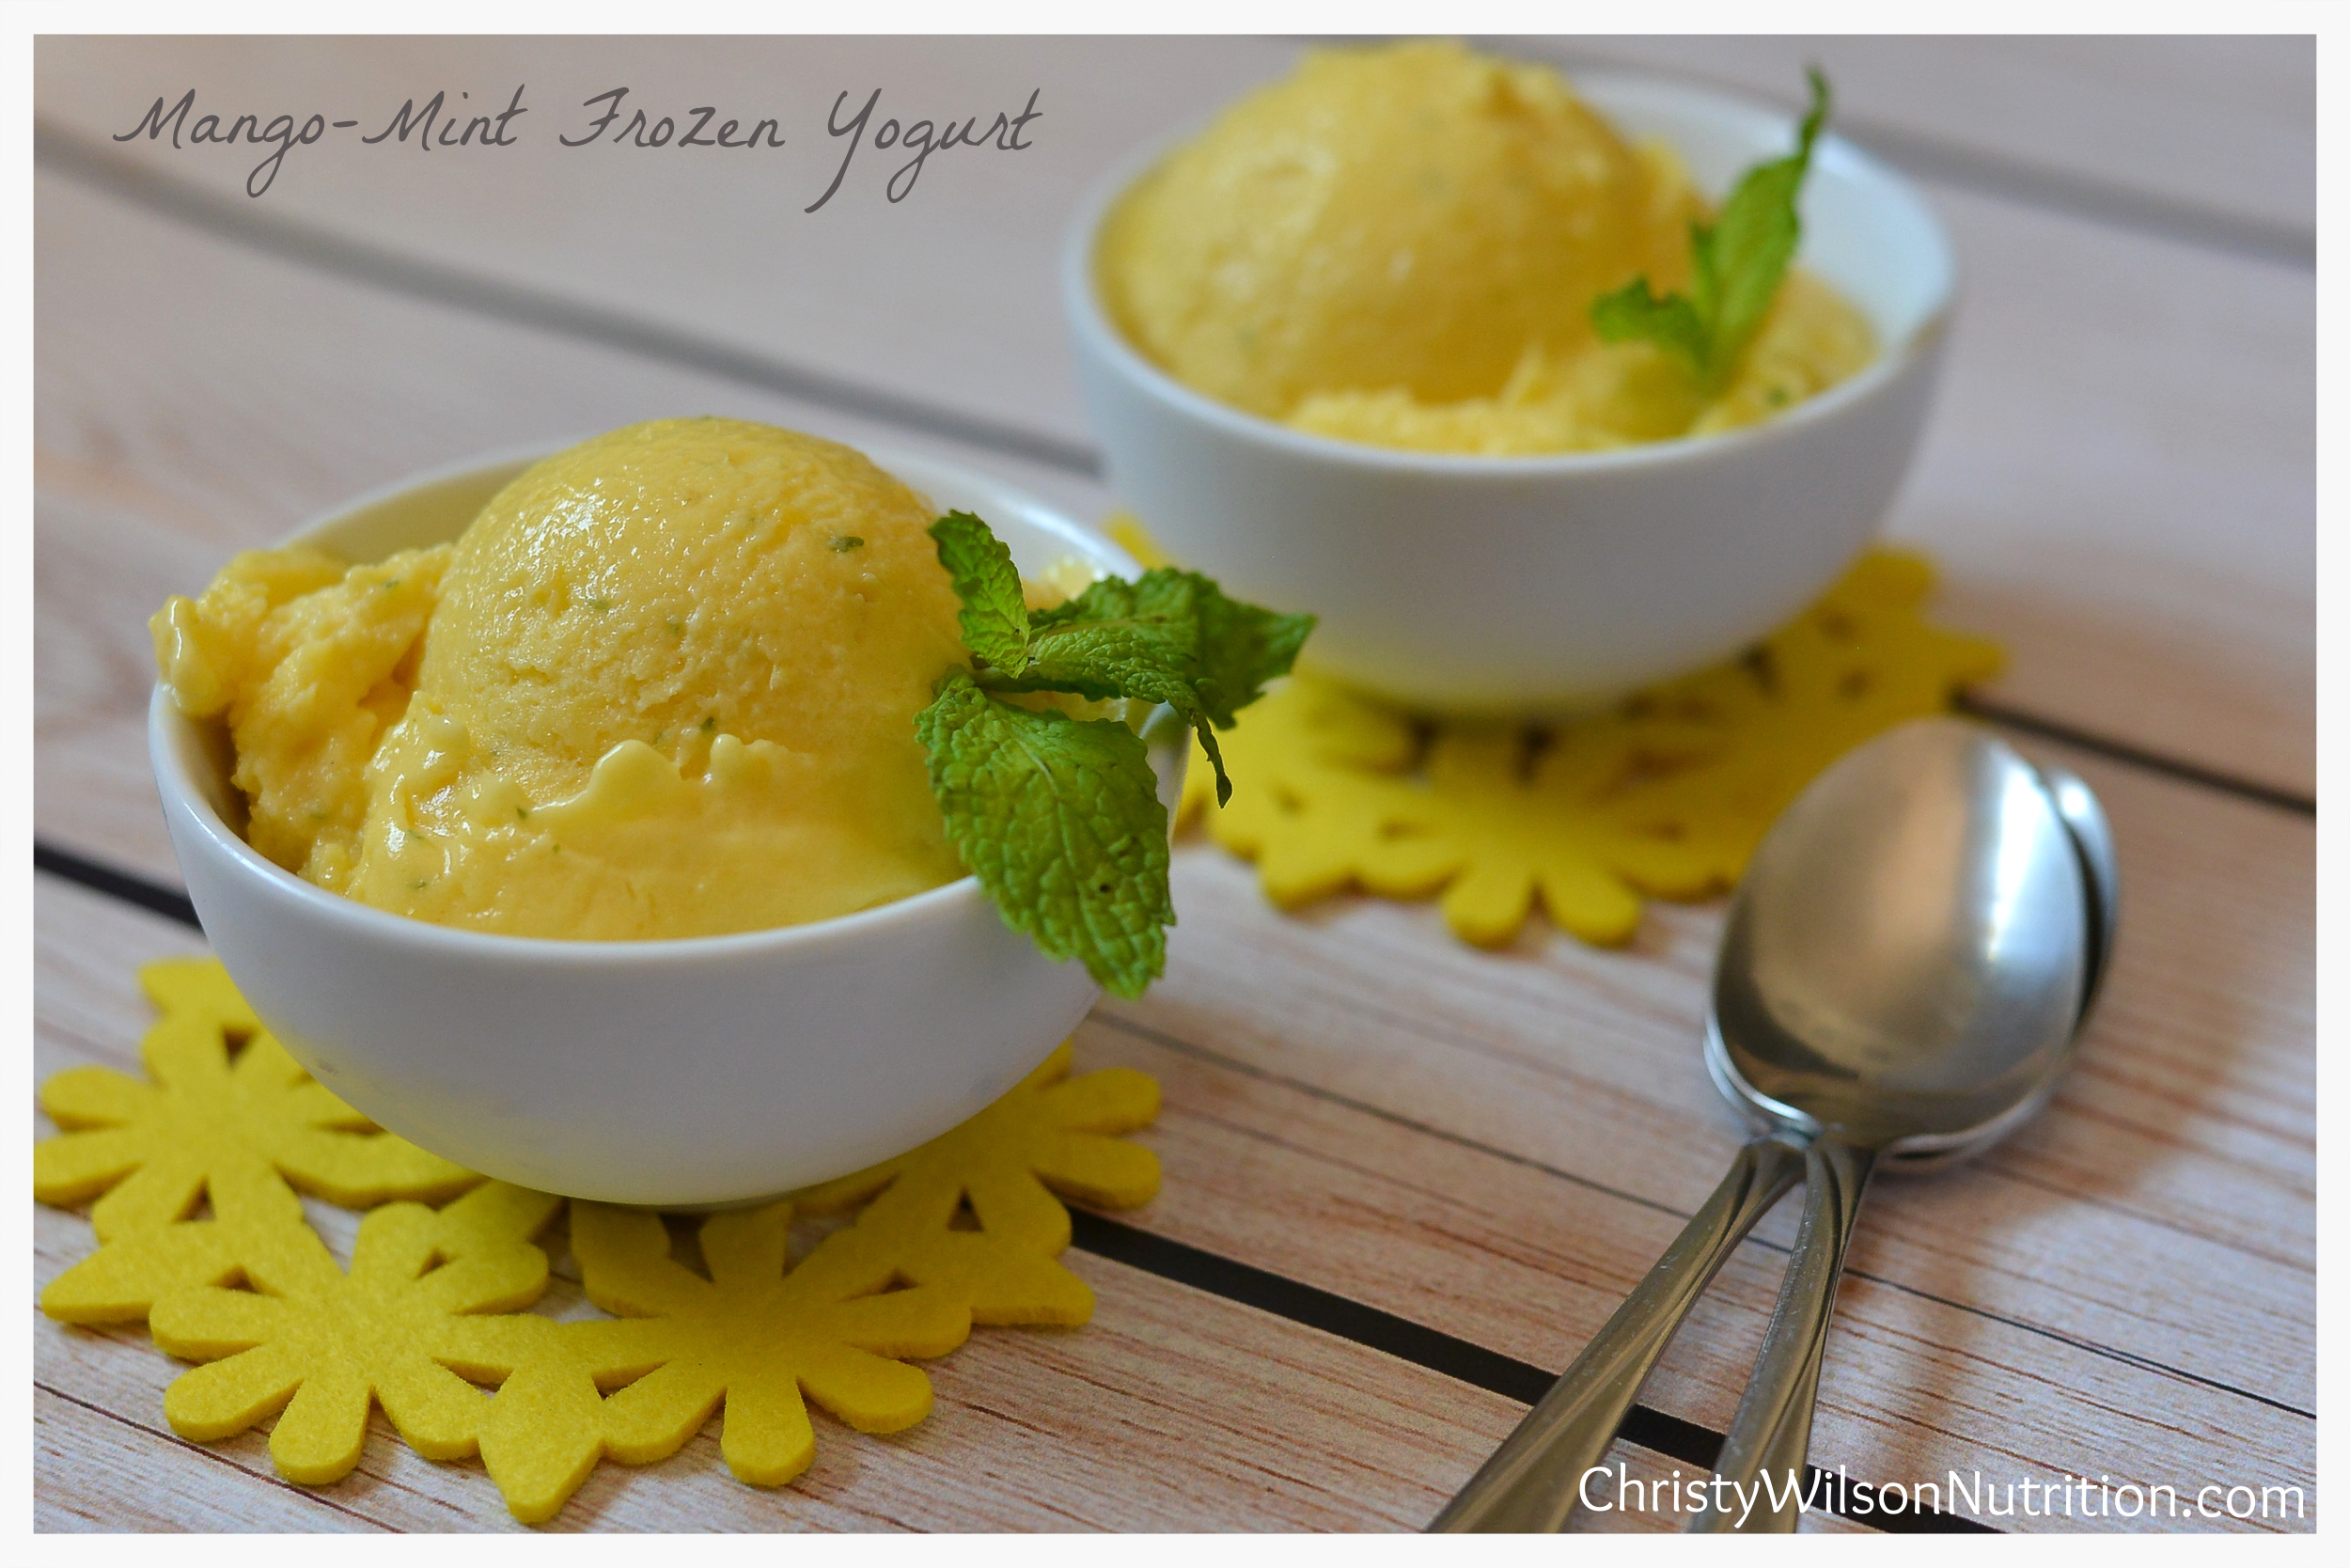 Mango Mint Frozen Yogurt dish